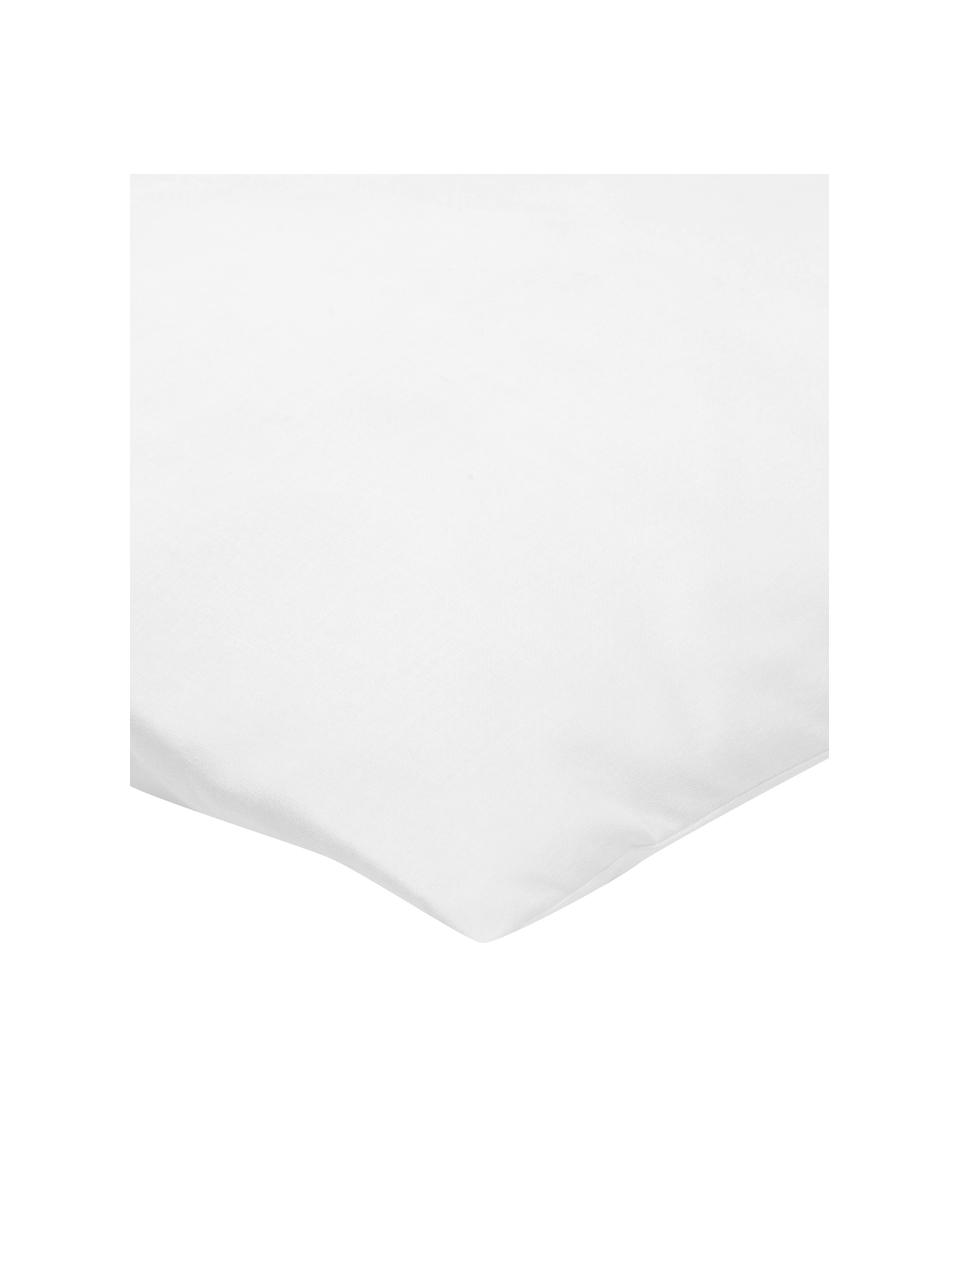 Microfiber kussenvulling Sia, 40 x 40 cm, Wit, 40 x 40 cm